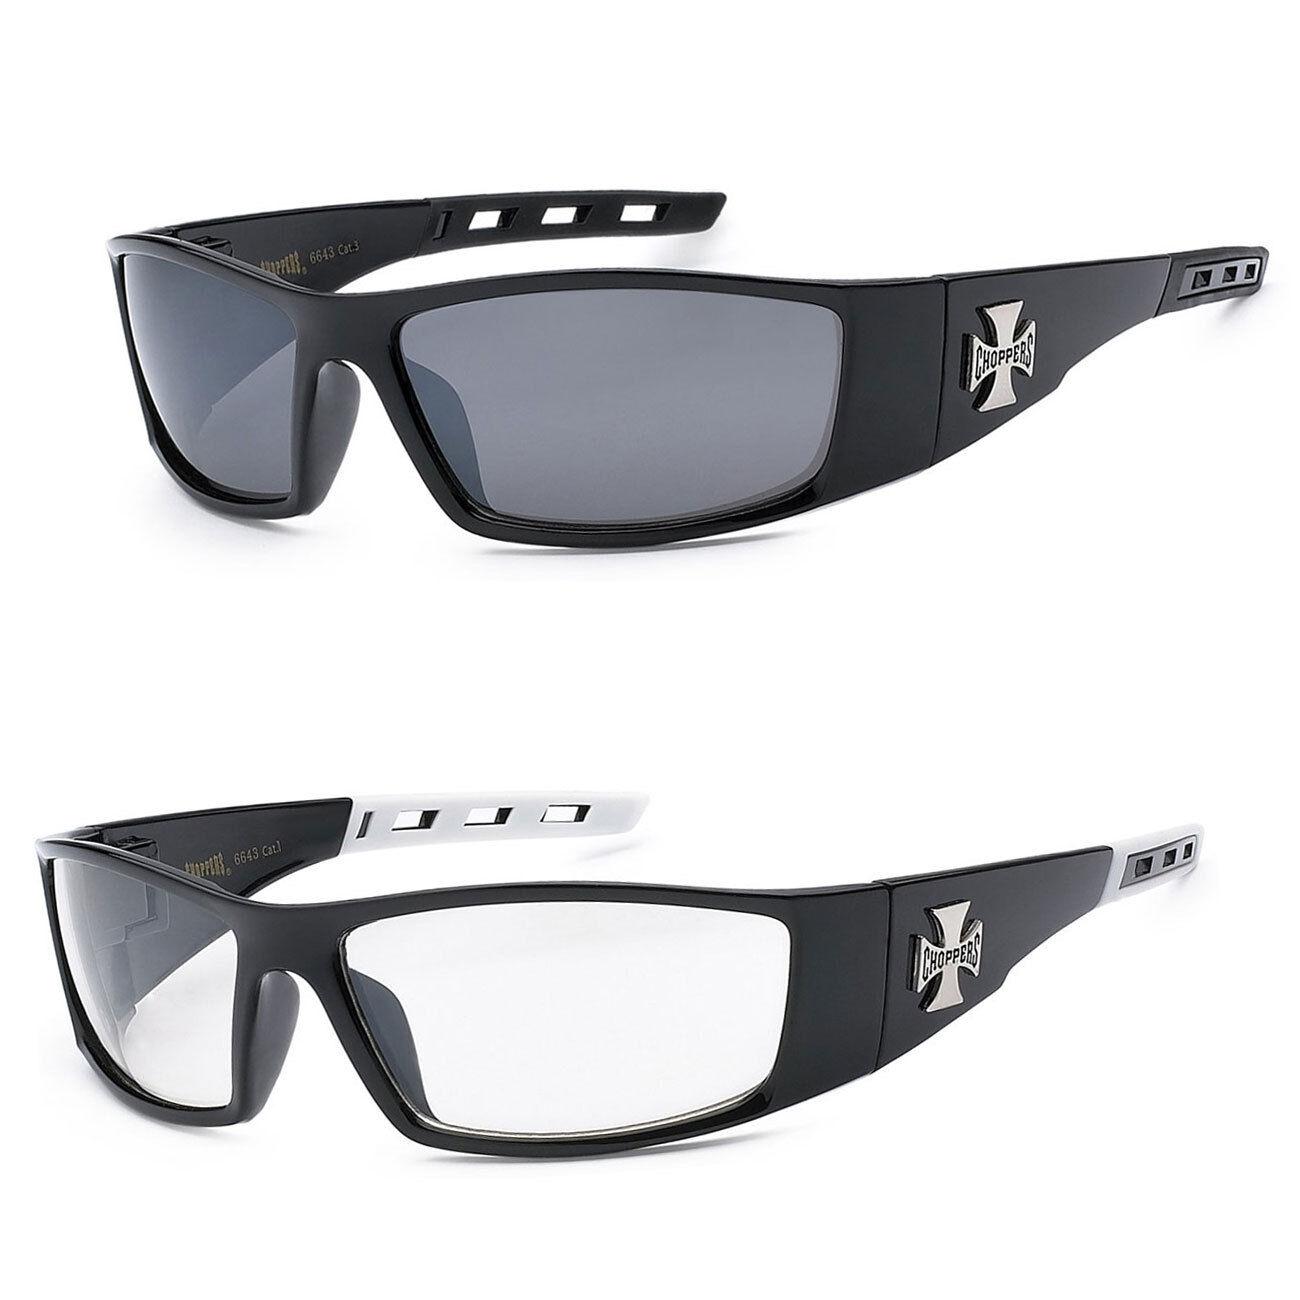 e1c00c102c385 Details about 2 PAIR COMBO Chopper Sunglasses Motorcycle Glasses Smoke   Clear  Lens C50